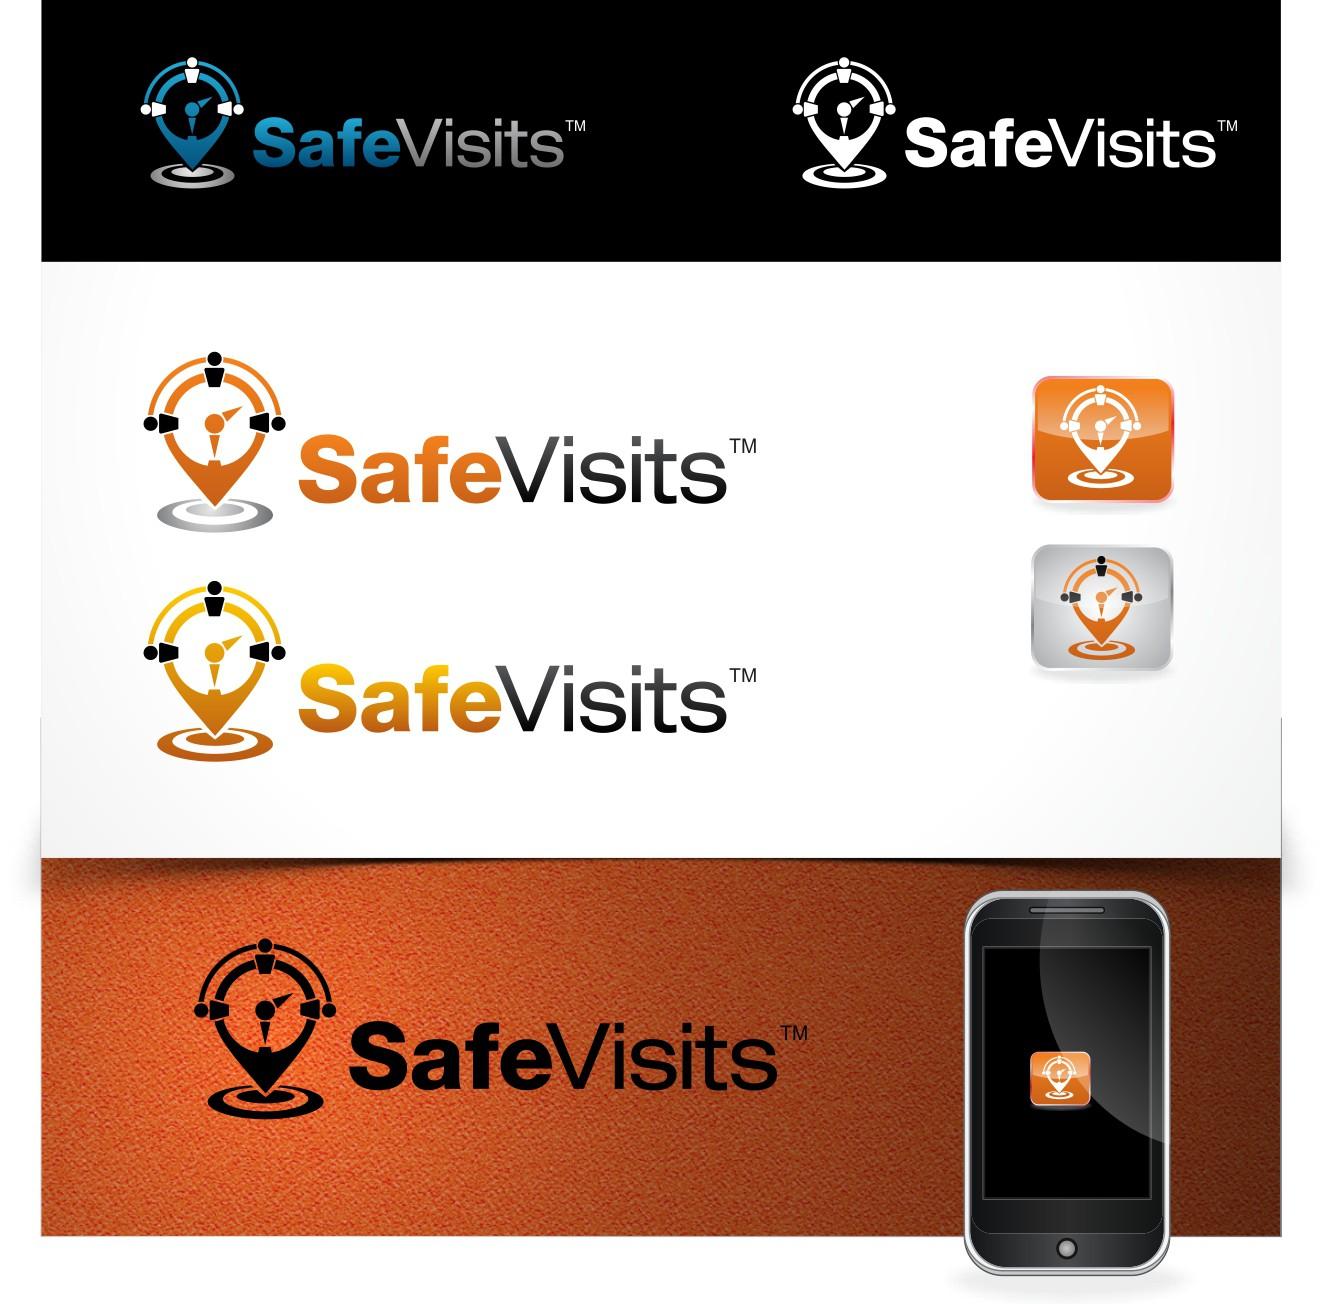 SafeVisits needs a new logo